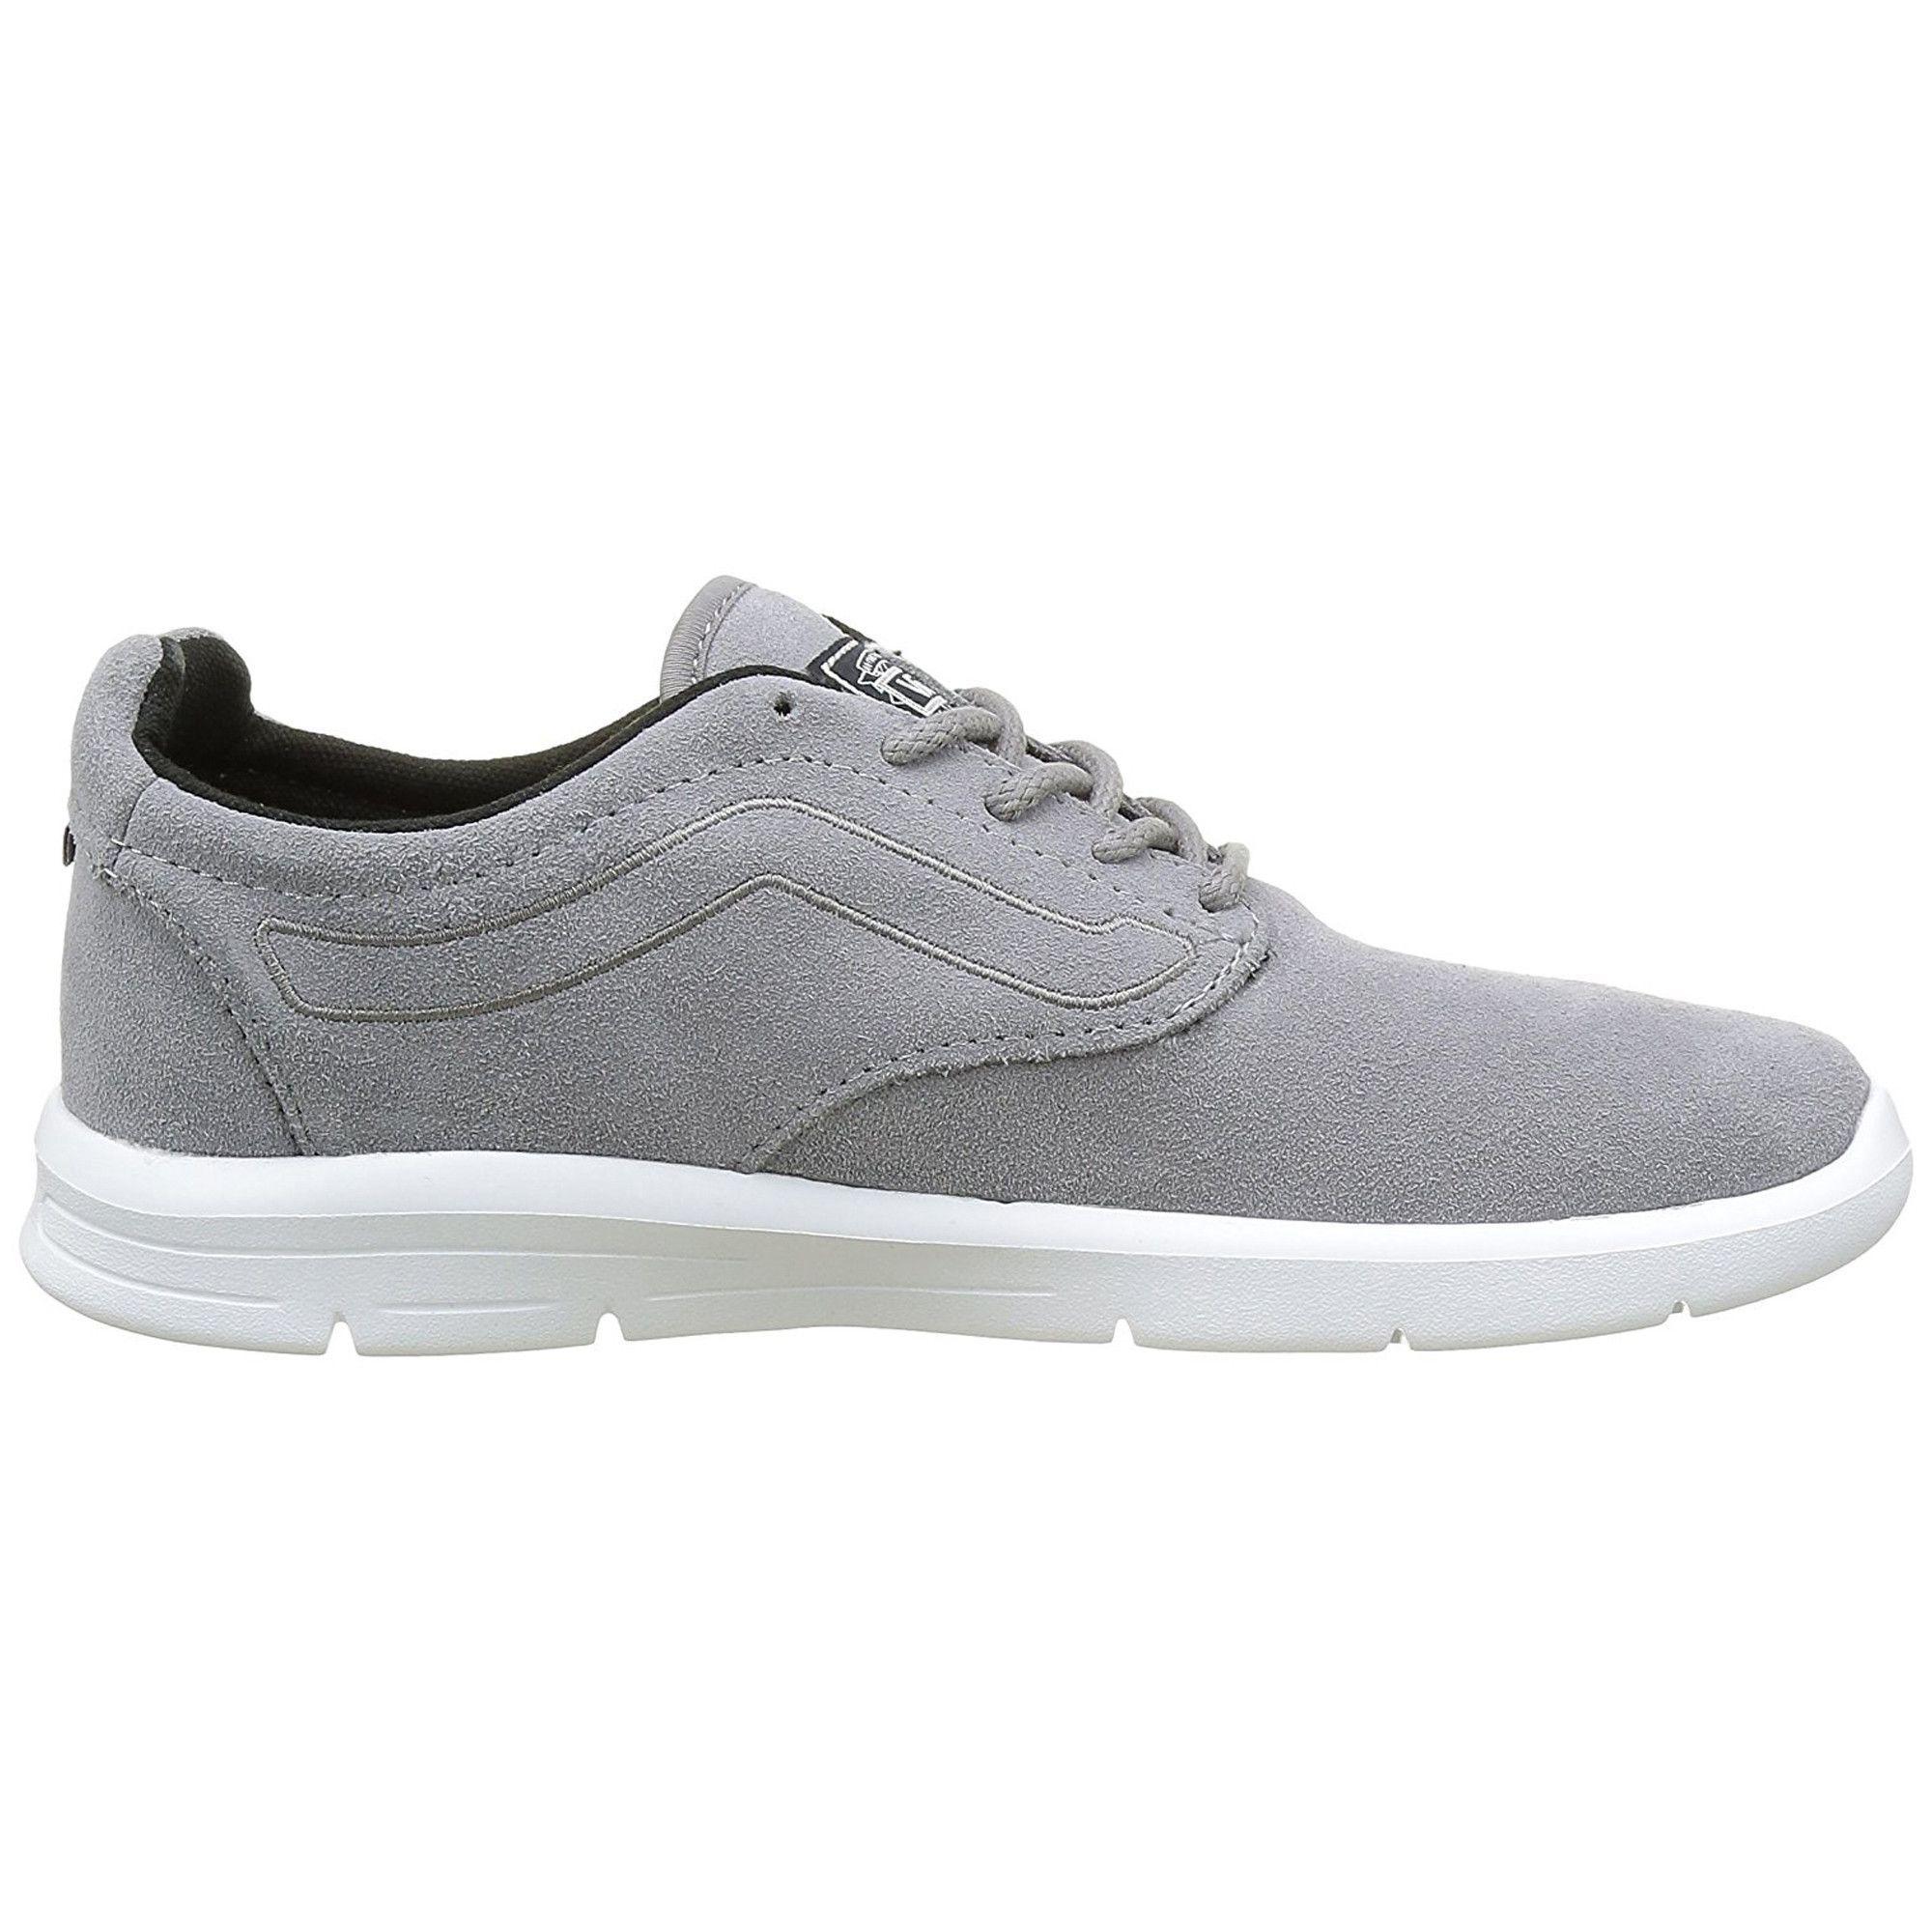 a5cb6bd101 VANS Men s ISO 1.5 Mesh Shoe